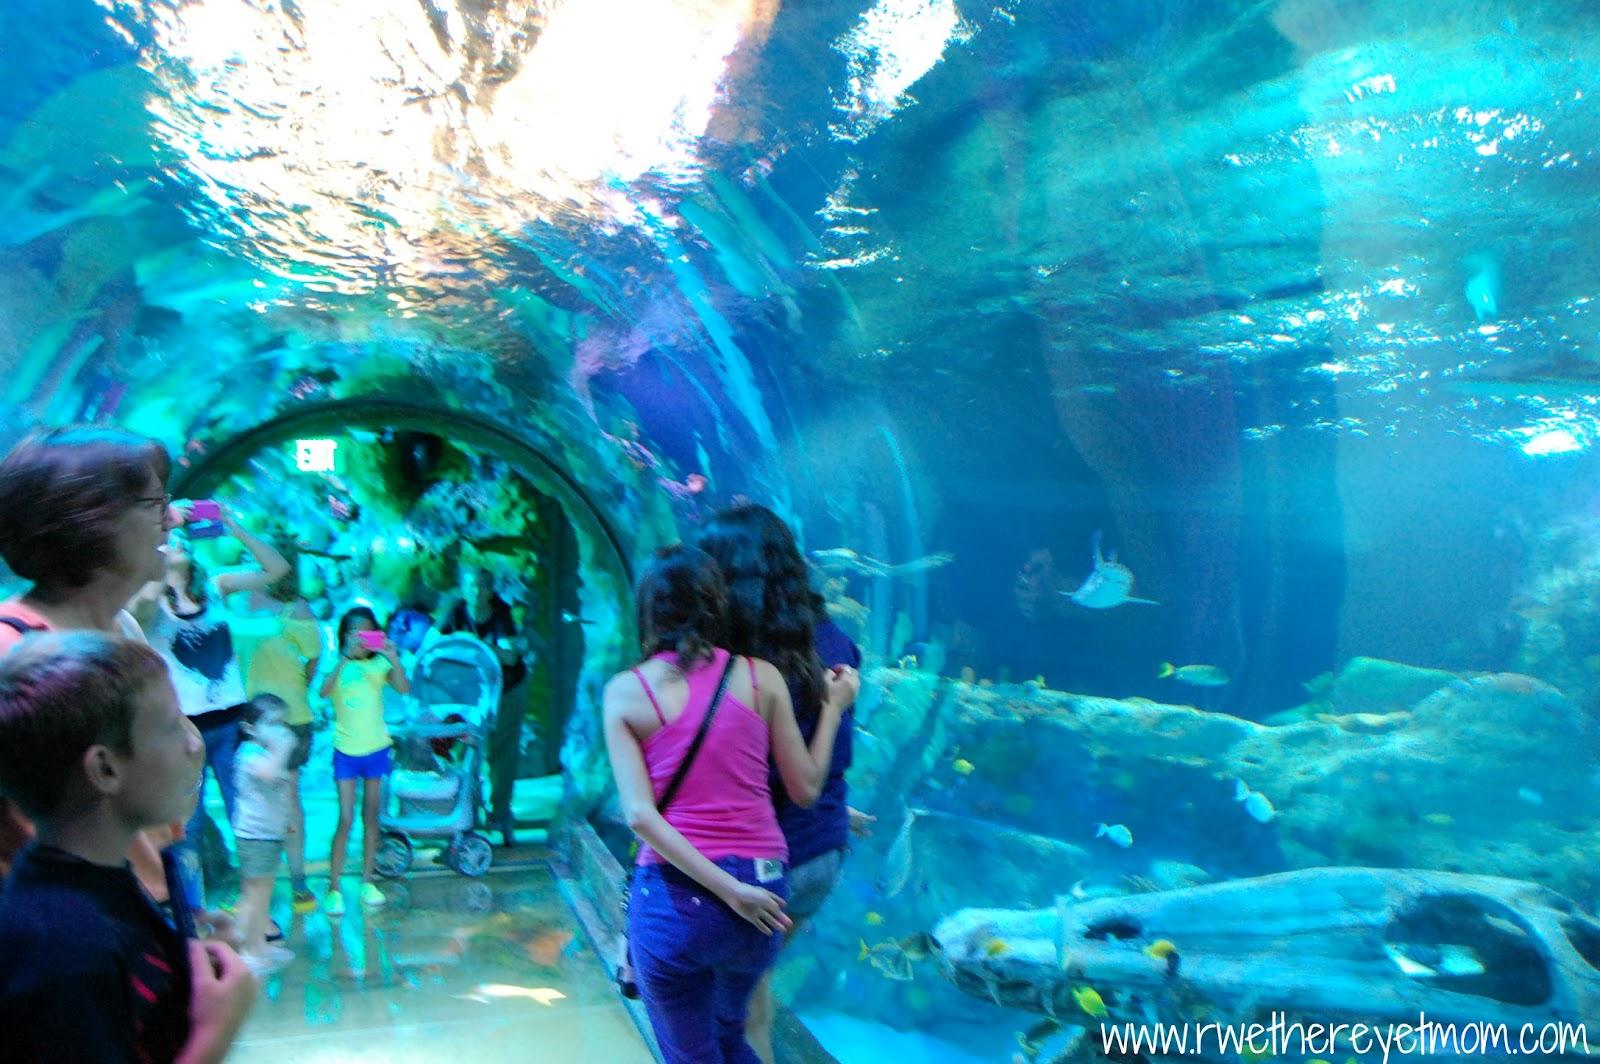 Grapevine Sea Life Aquarium Grapevine Texas R We There Yet Mom